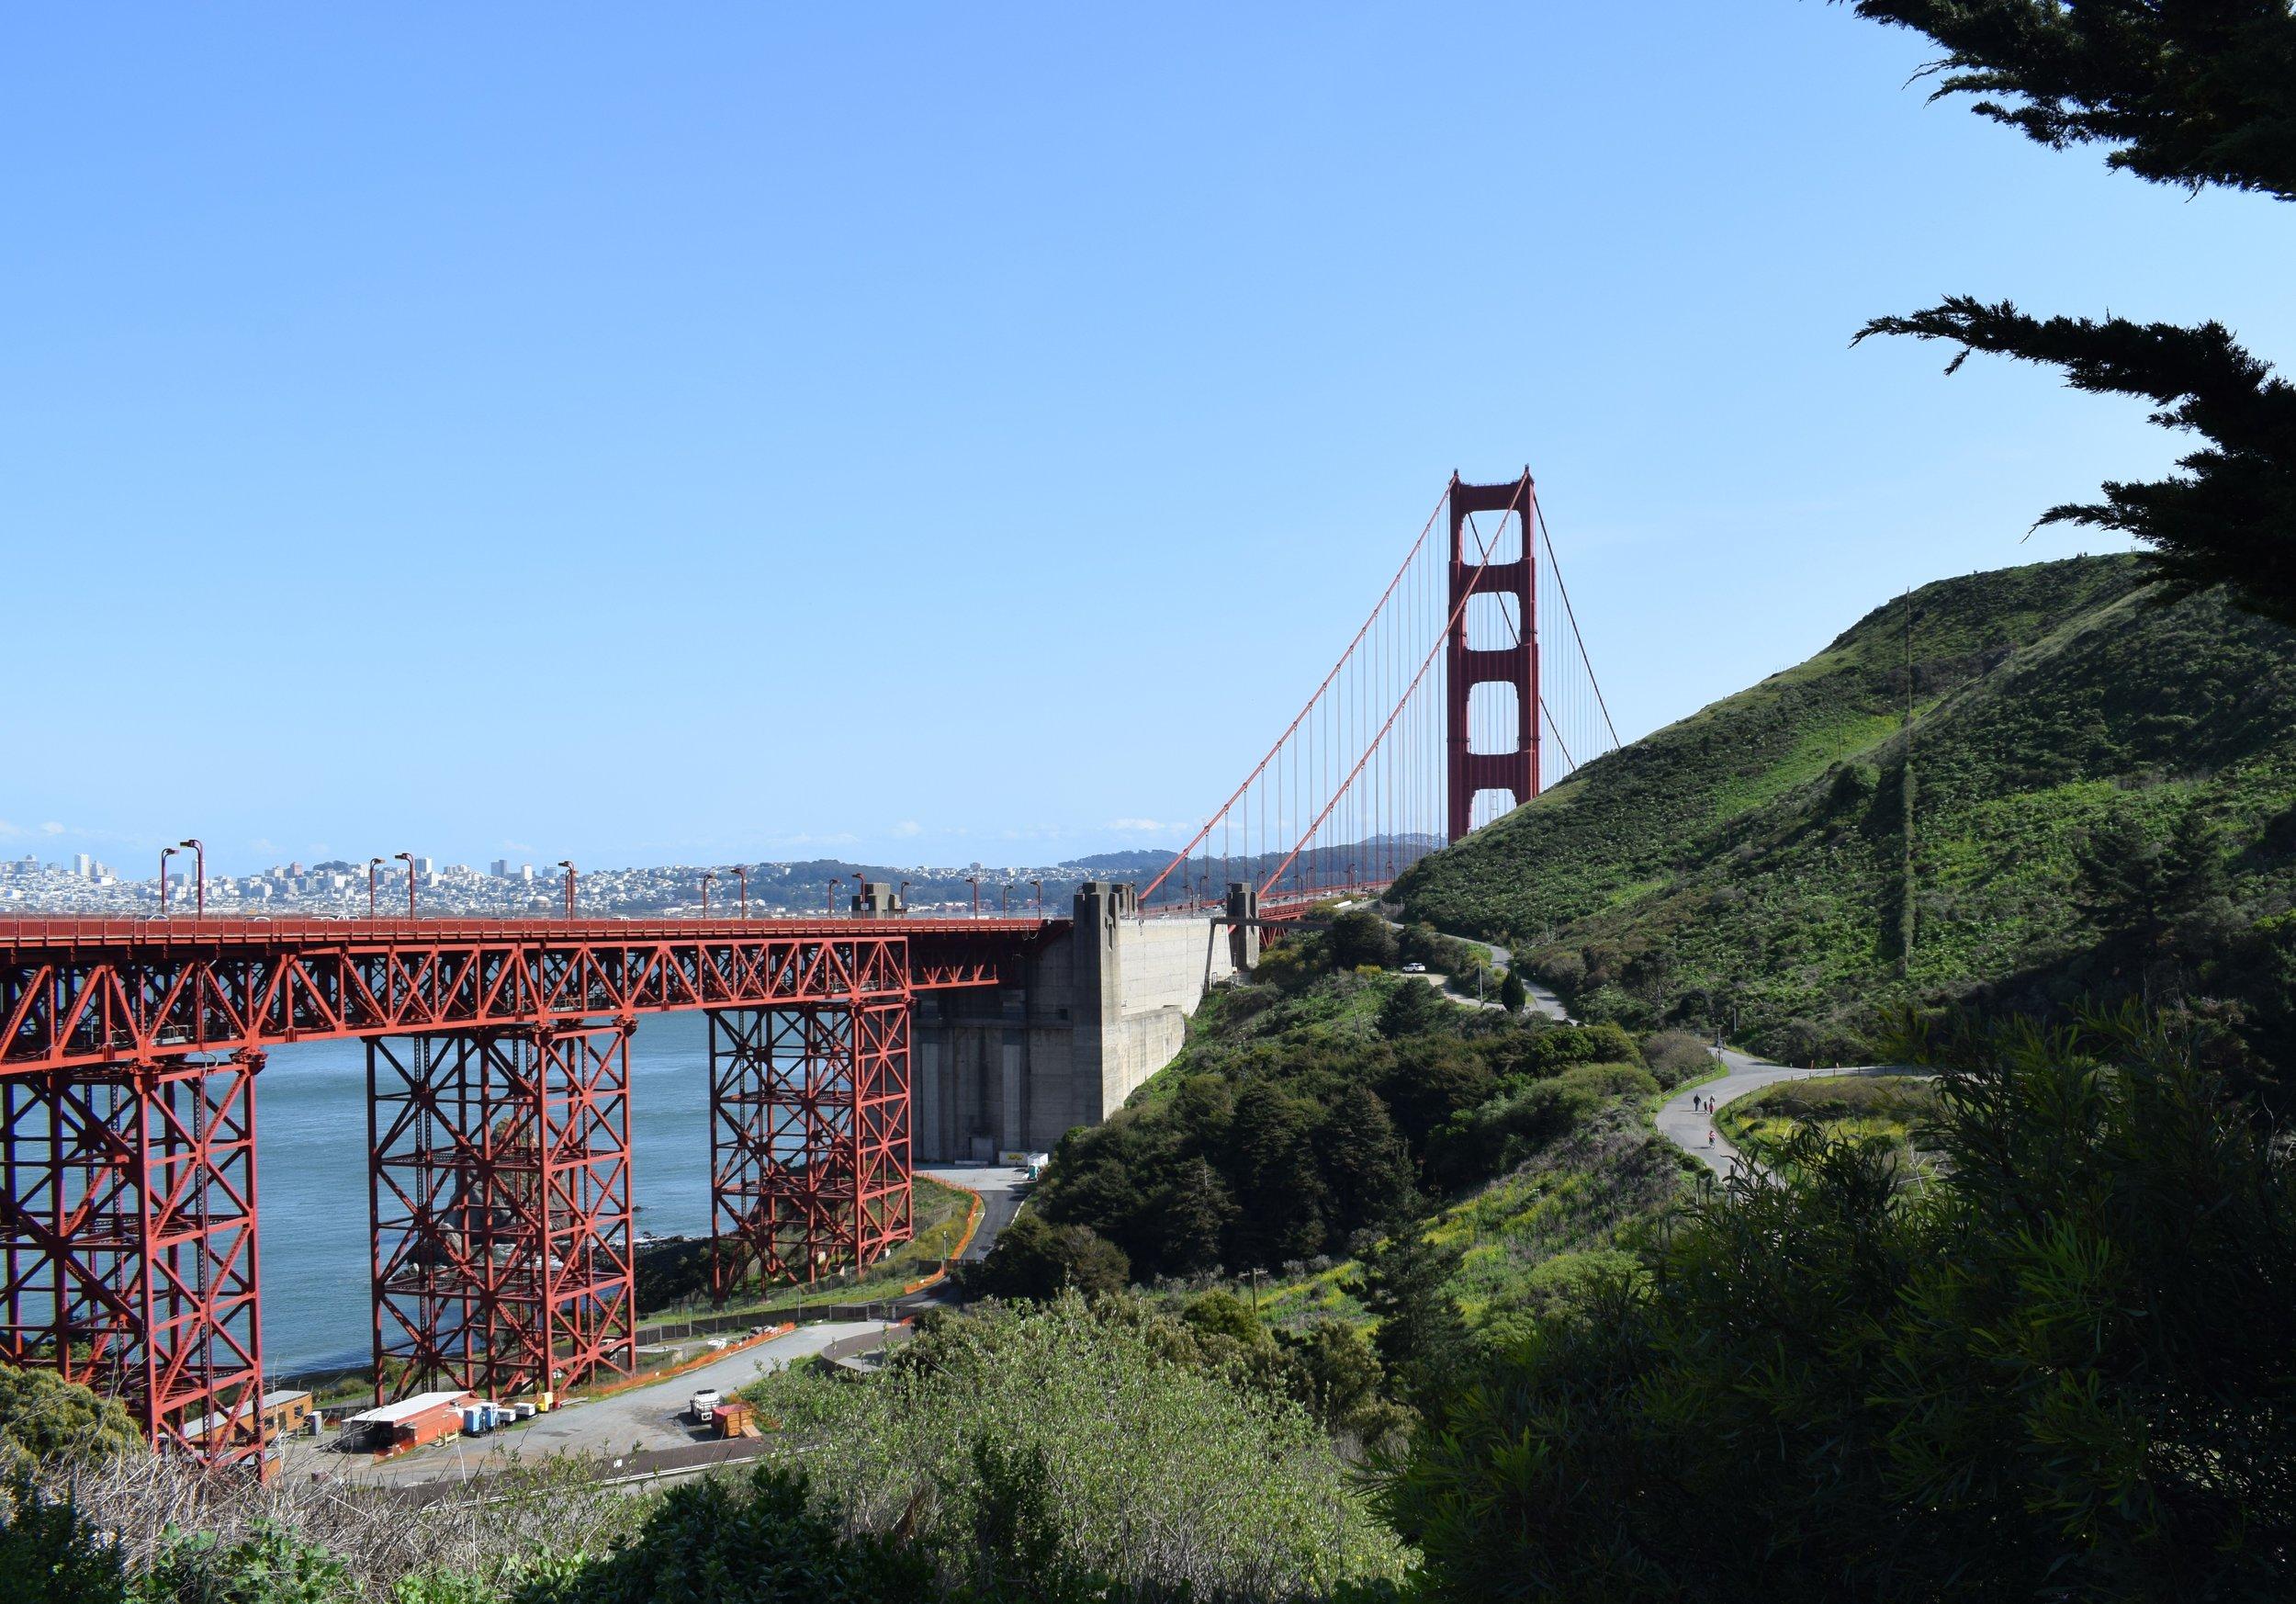 San Francisco Vista Point views